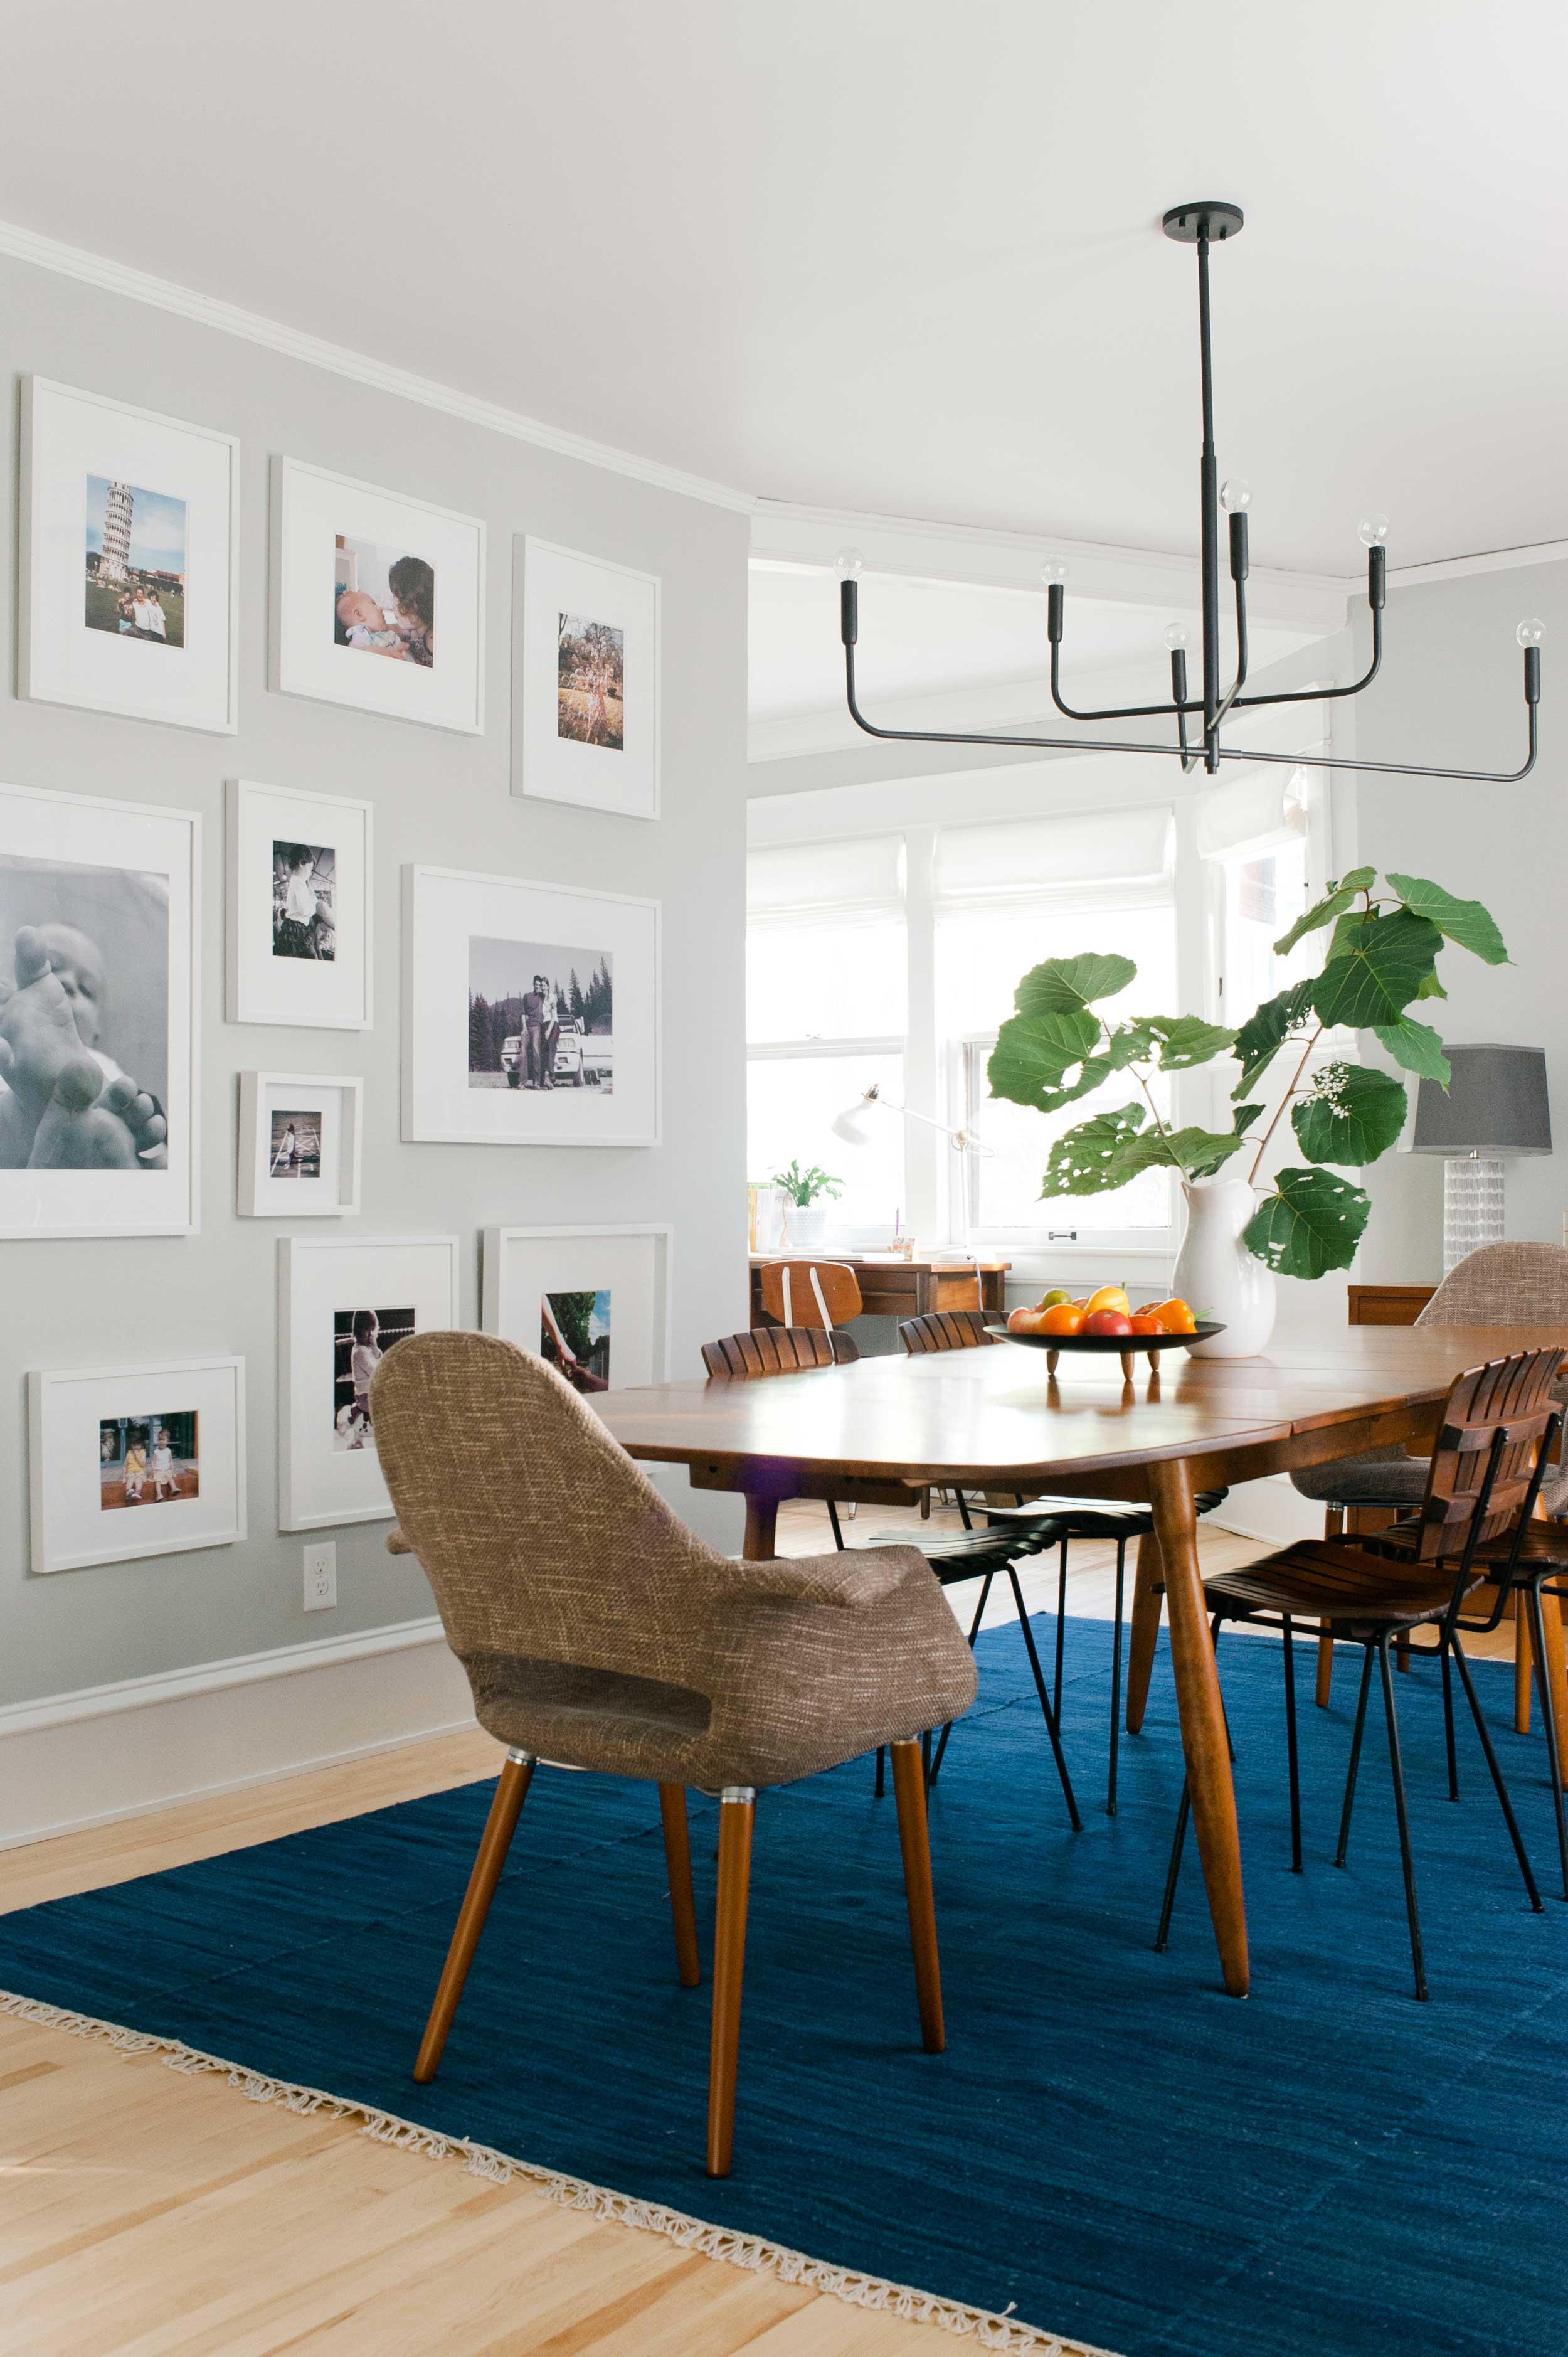 Best Painting Company Evanston.jpg